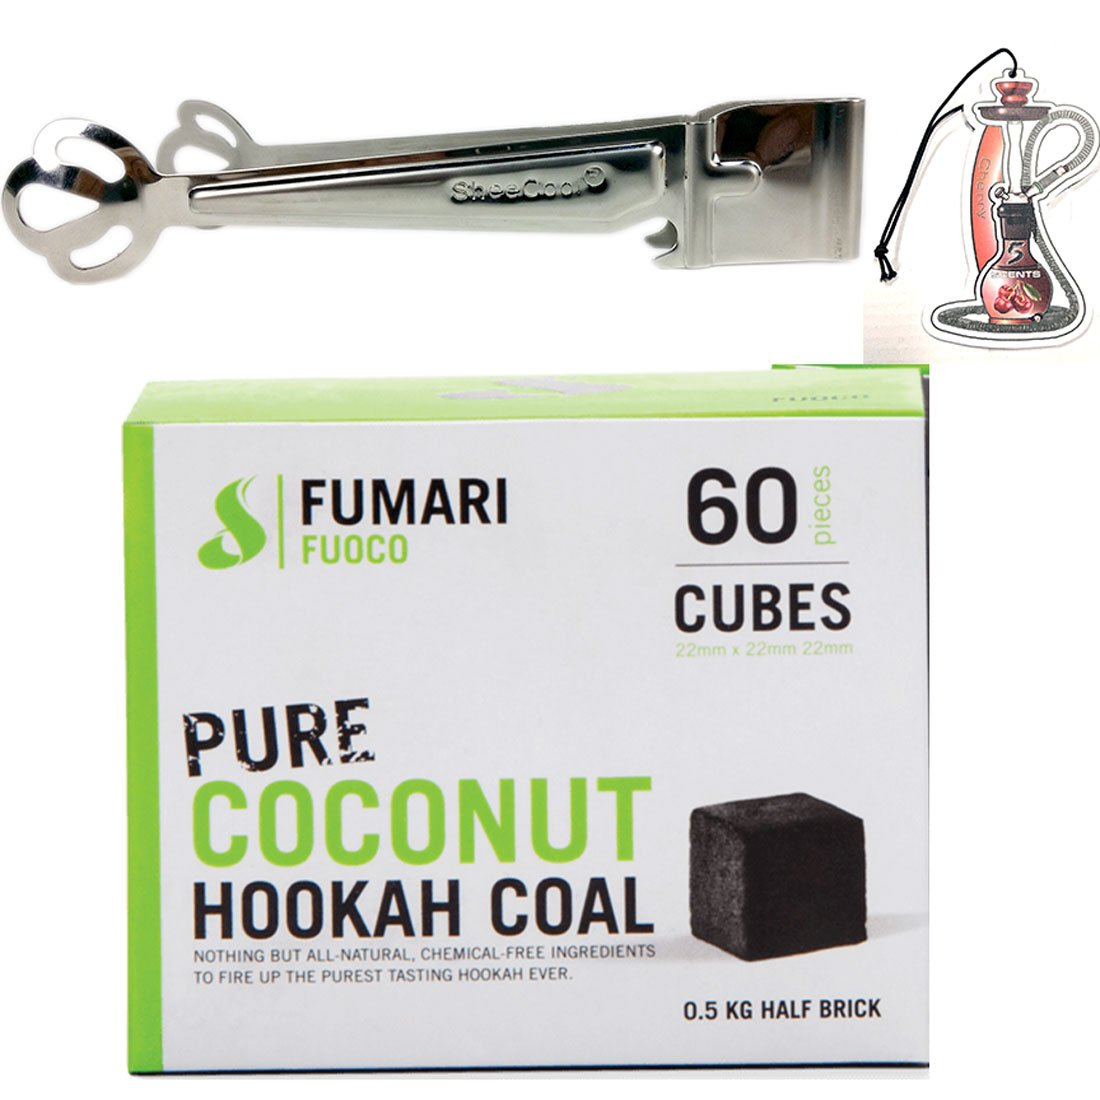 FUOCO 60 Medium CUBE COCONUT HOOKAH COAL BY FUMARI Shisha Natural Charcoal With Bonus Sheecool HangingTongs